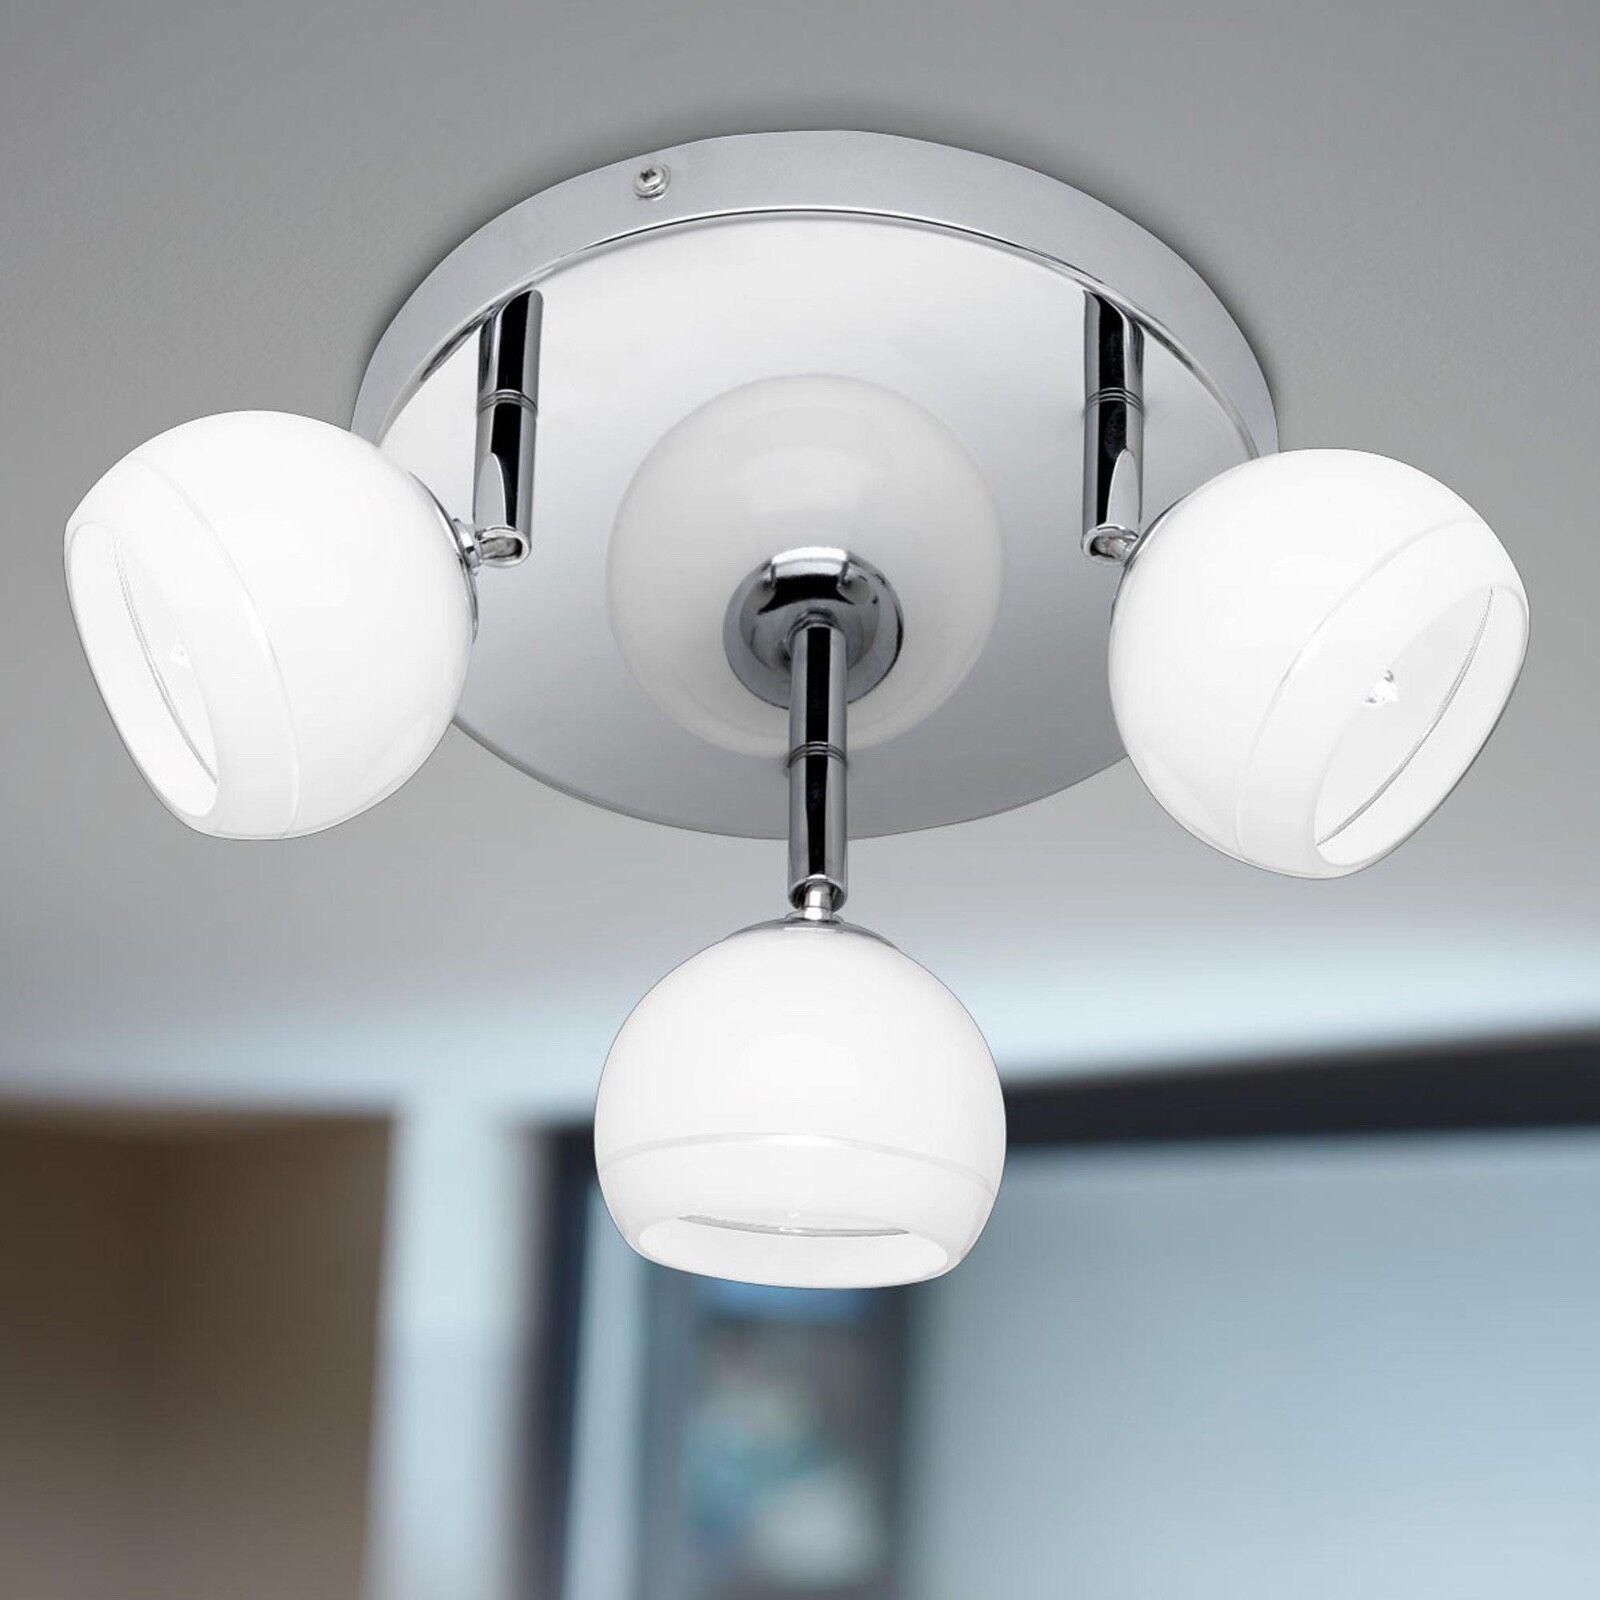 Wofi Lampada da soffitto Valley 3-flg cromo vetro bianco regolabile 99 Watt 1380 Lumen